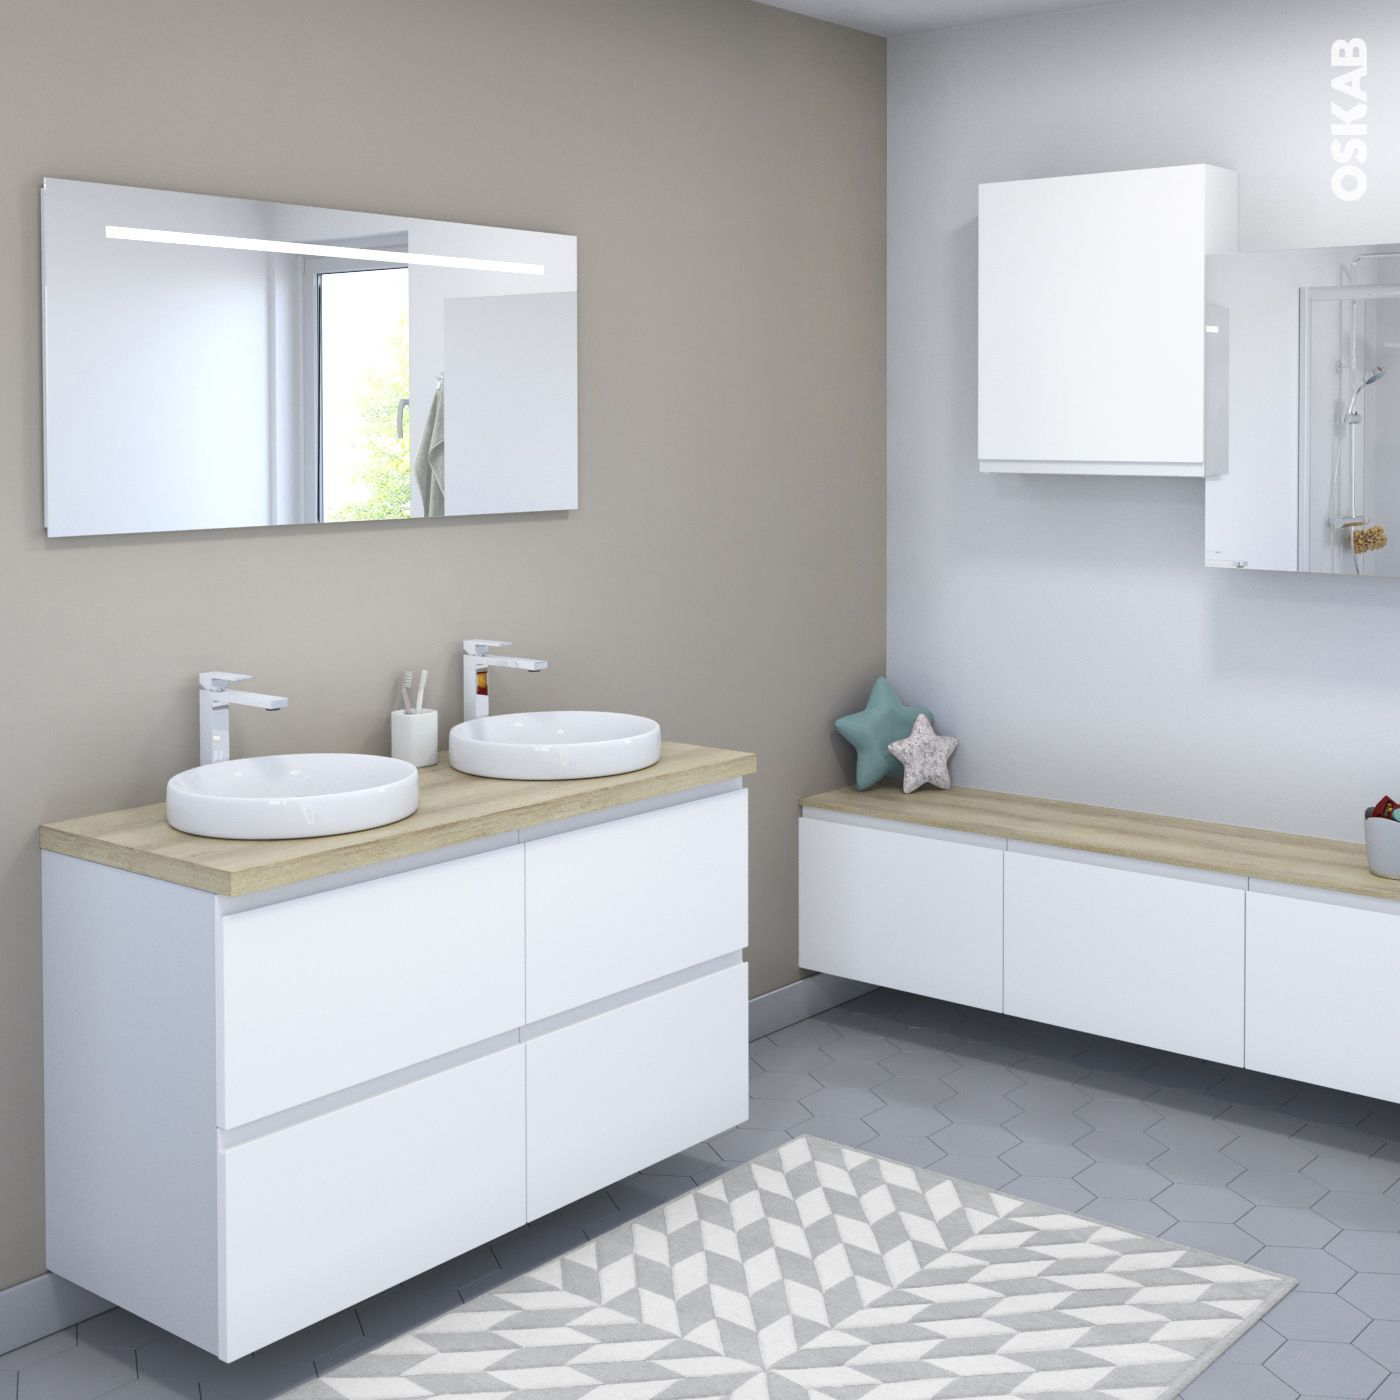 inflacio onkentes szarmazik deco salle de bain blanc et gris amazon